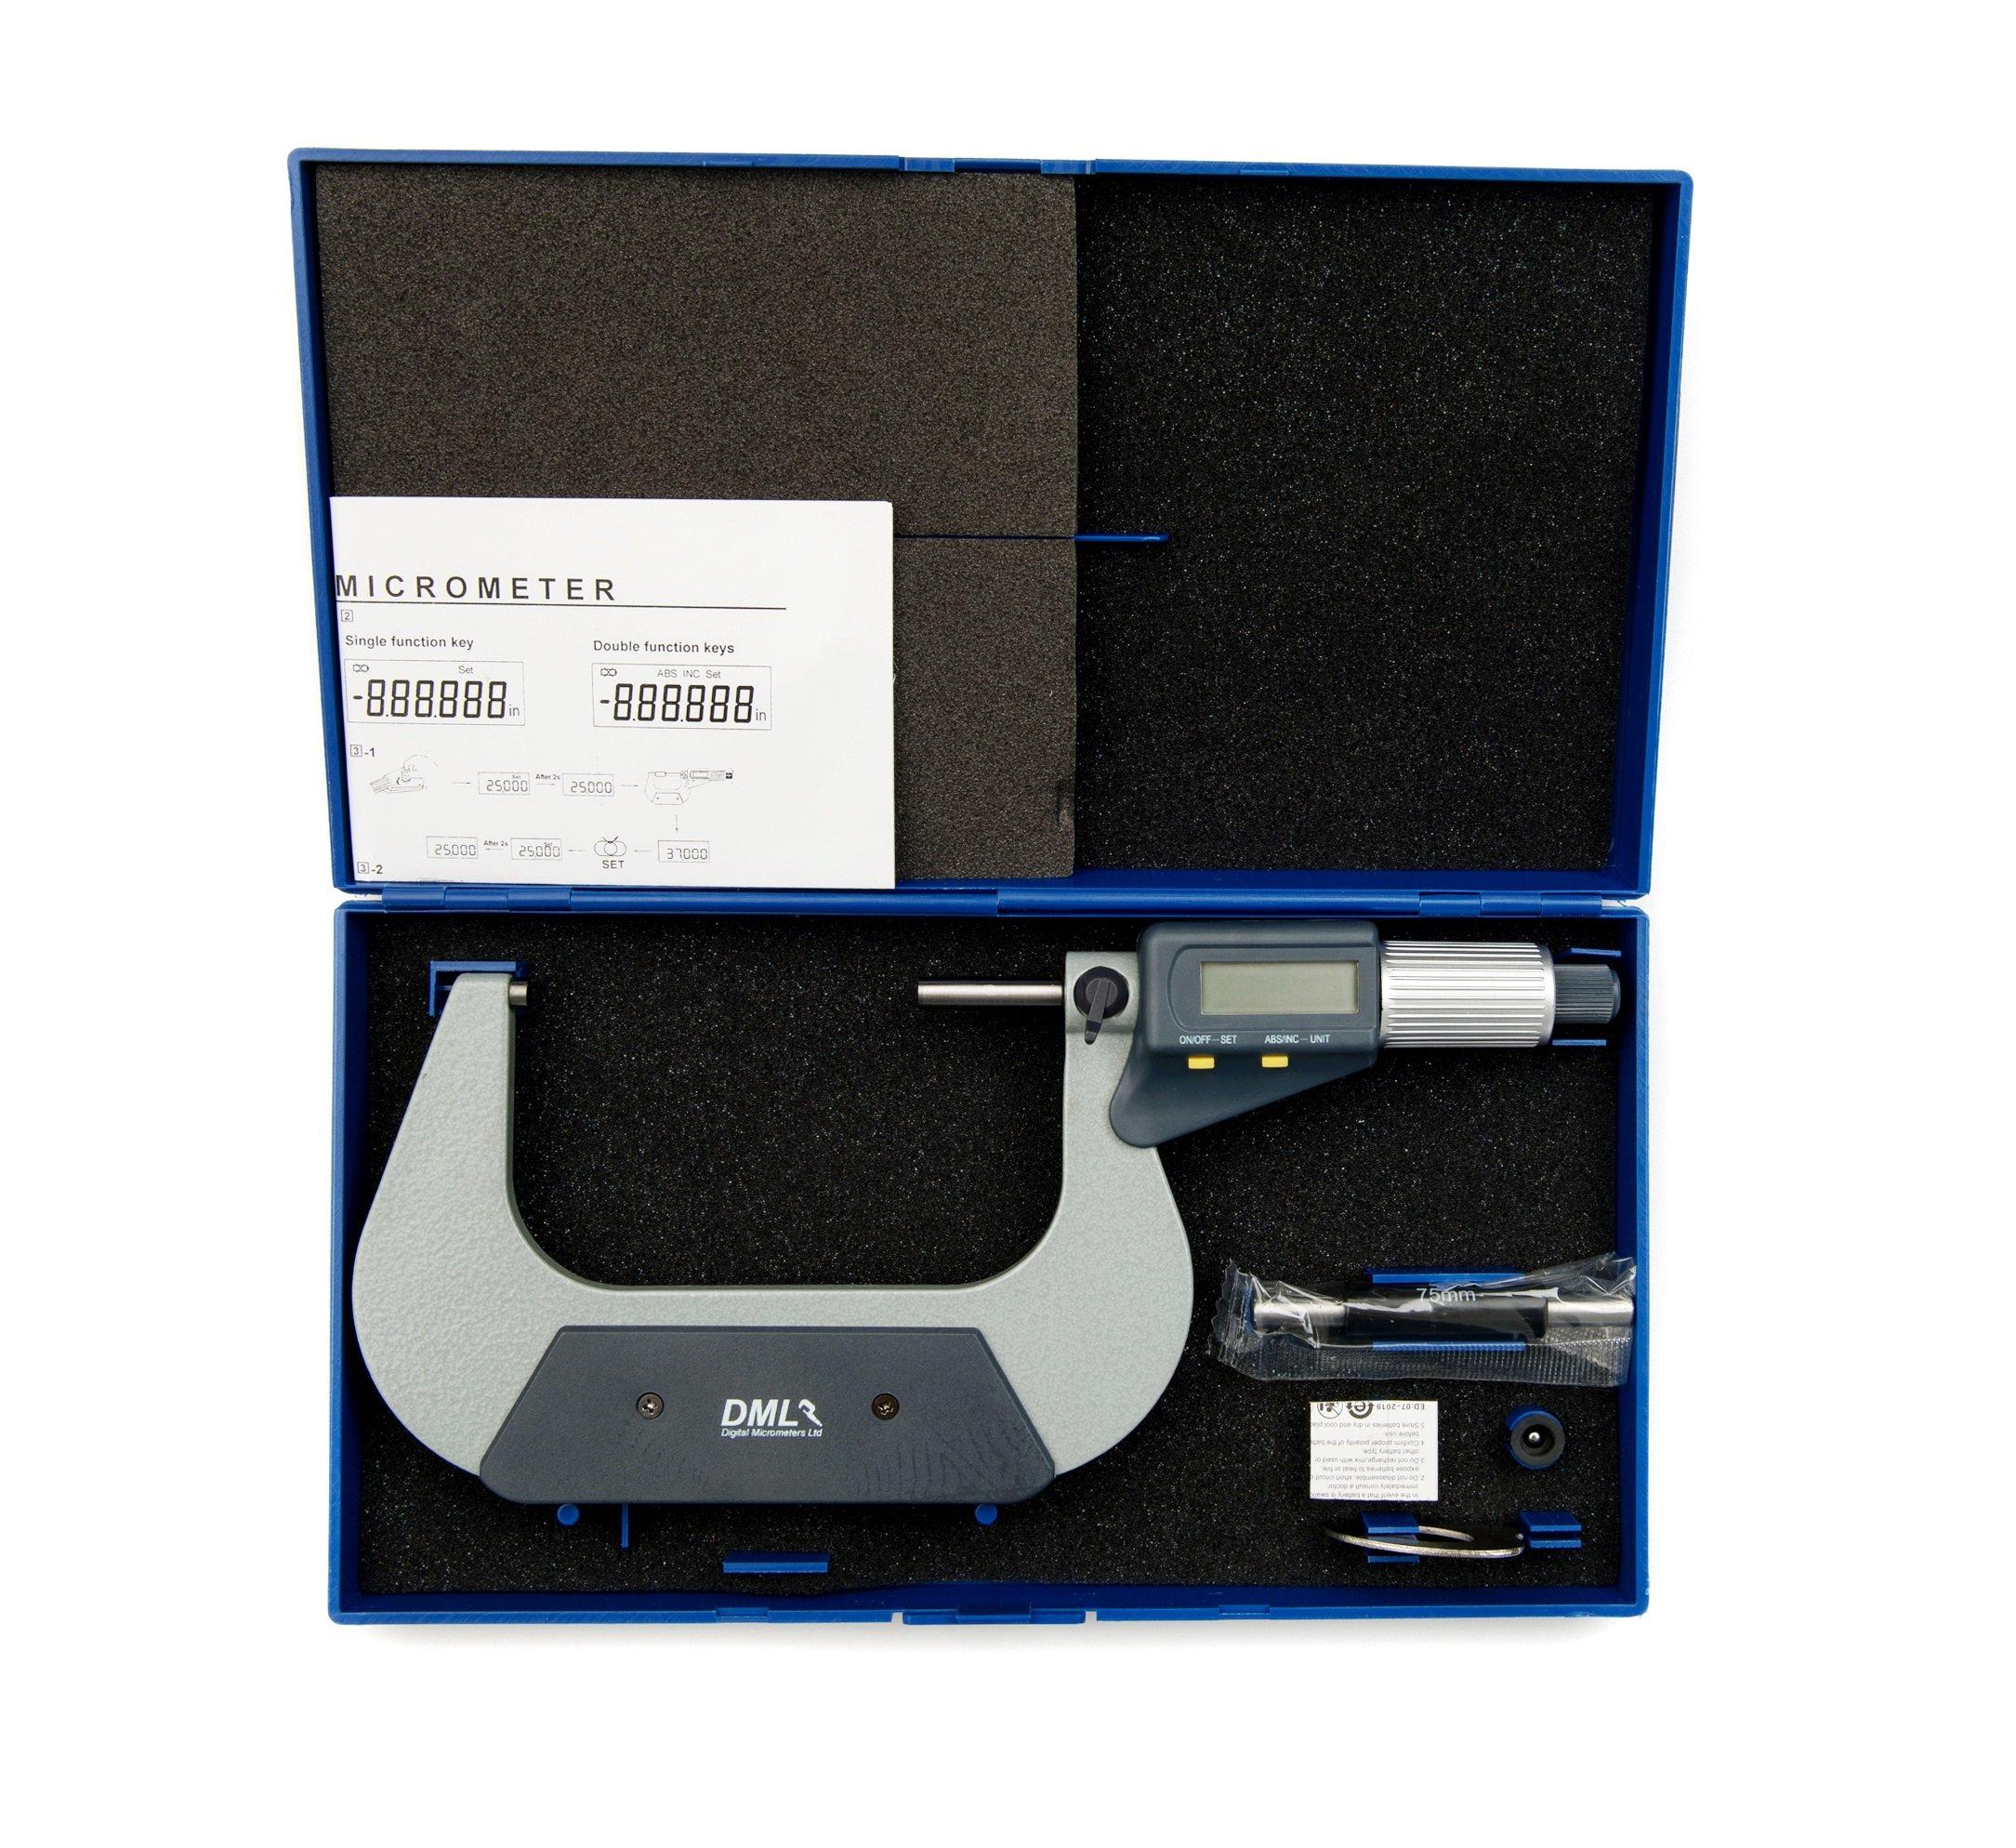 75-100mm IP54 Digital Micrometer DM3100 - Digital Micrometers Ltd